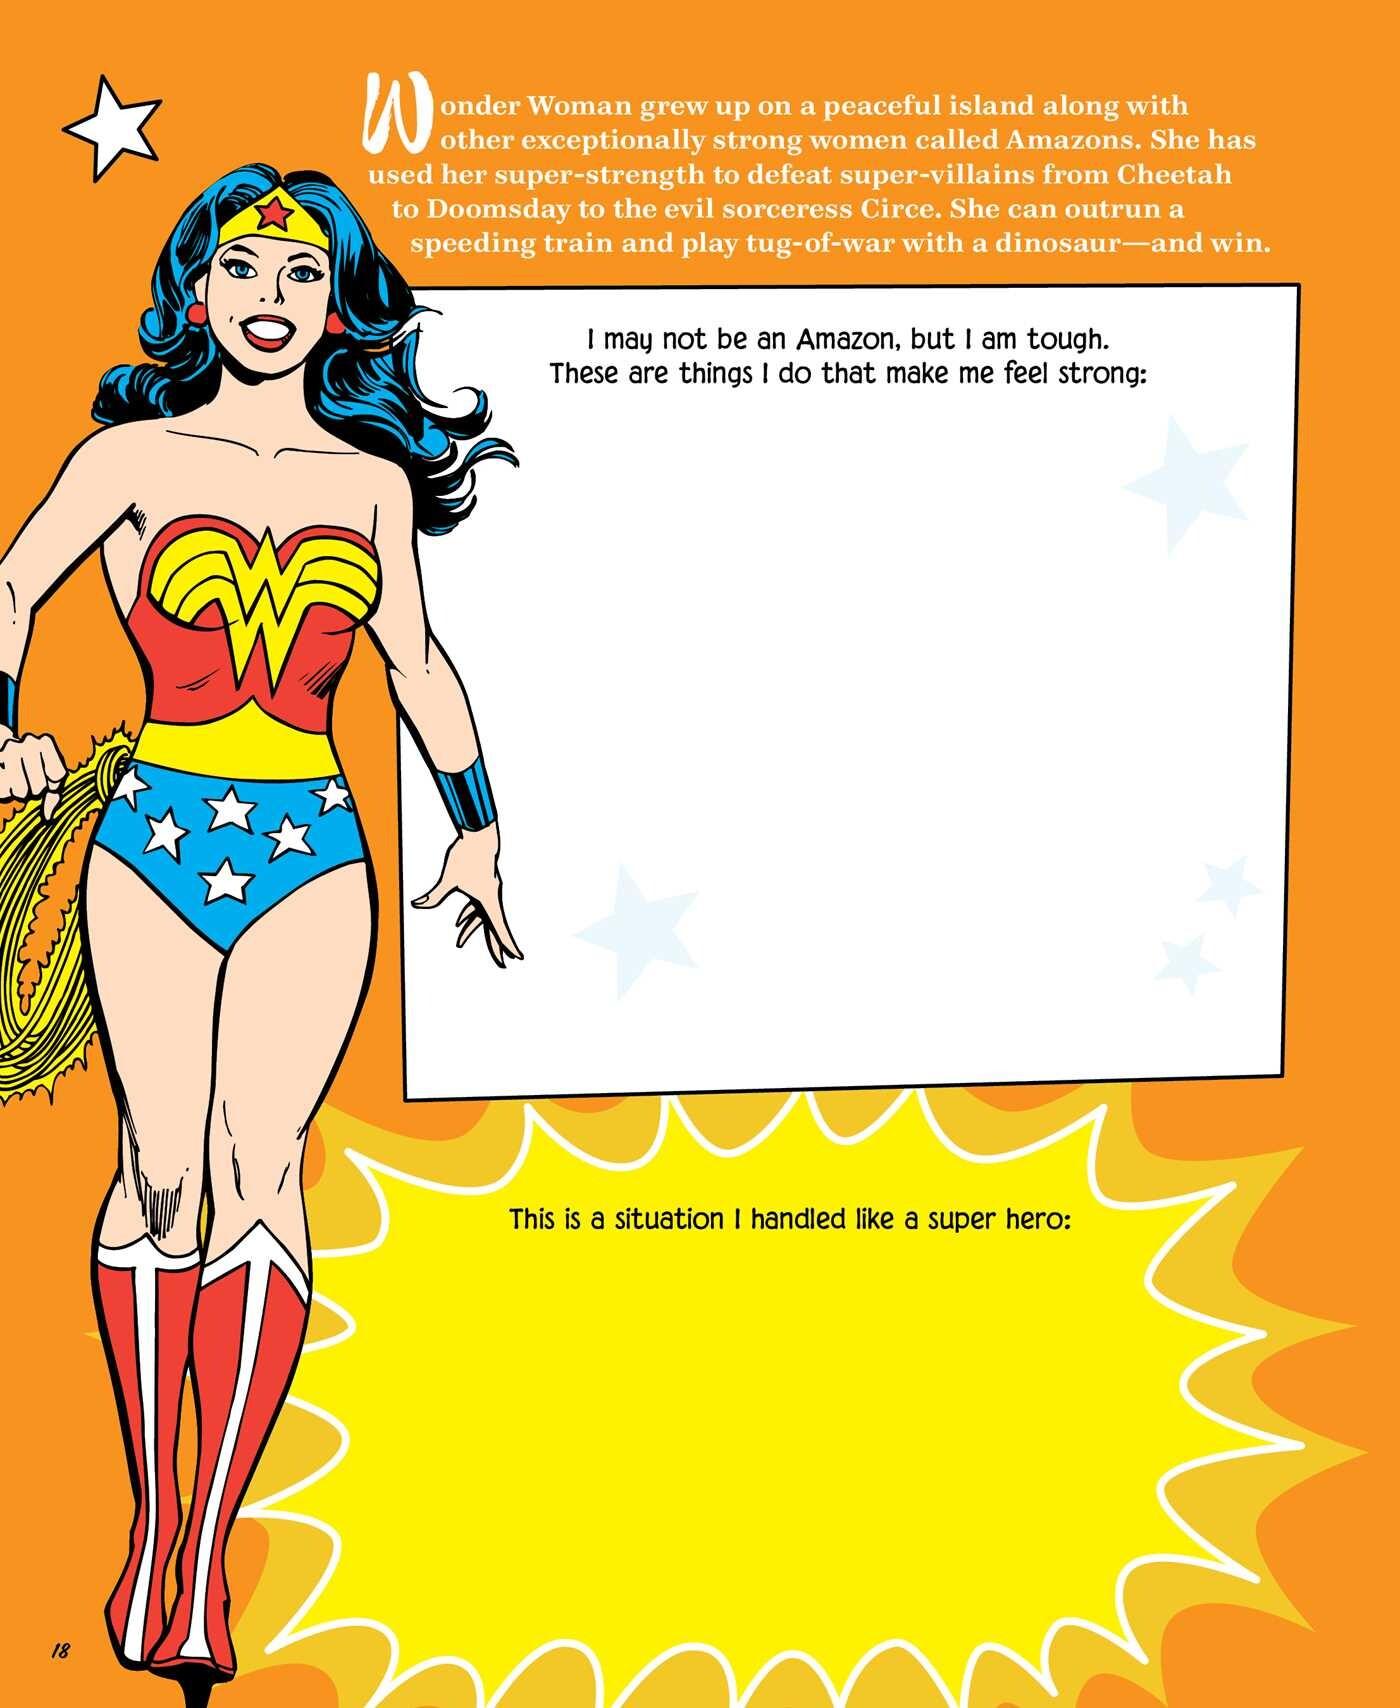 My girl power journal 9781941367346.in18